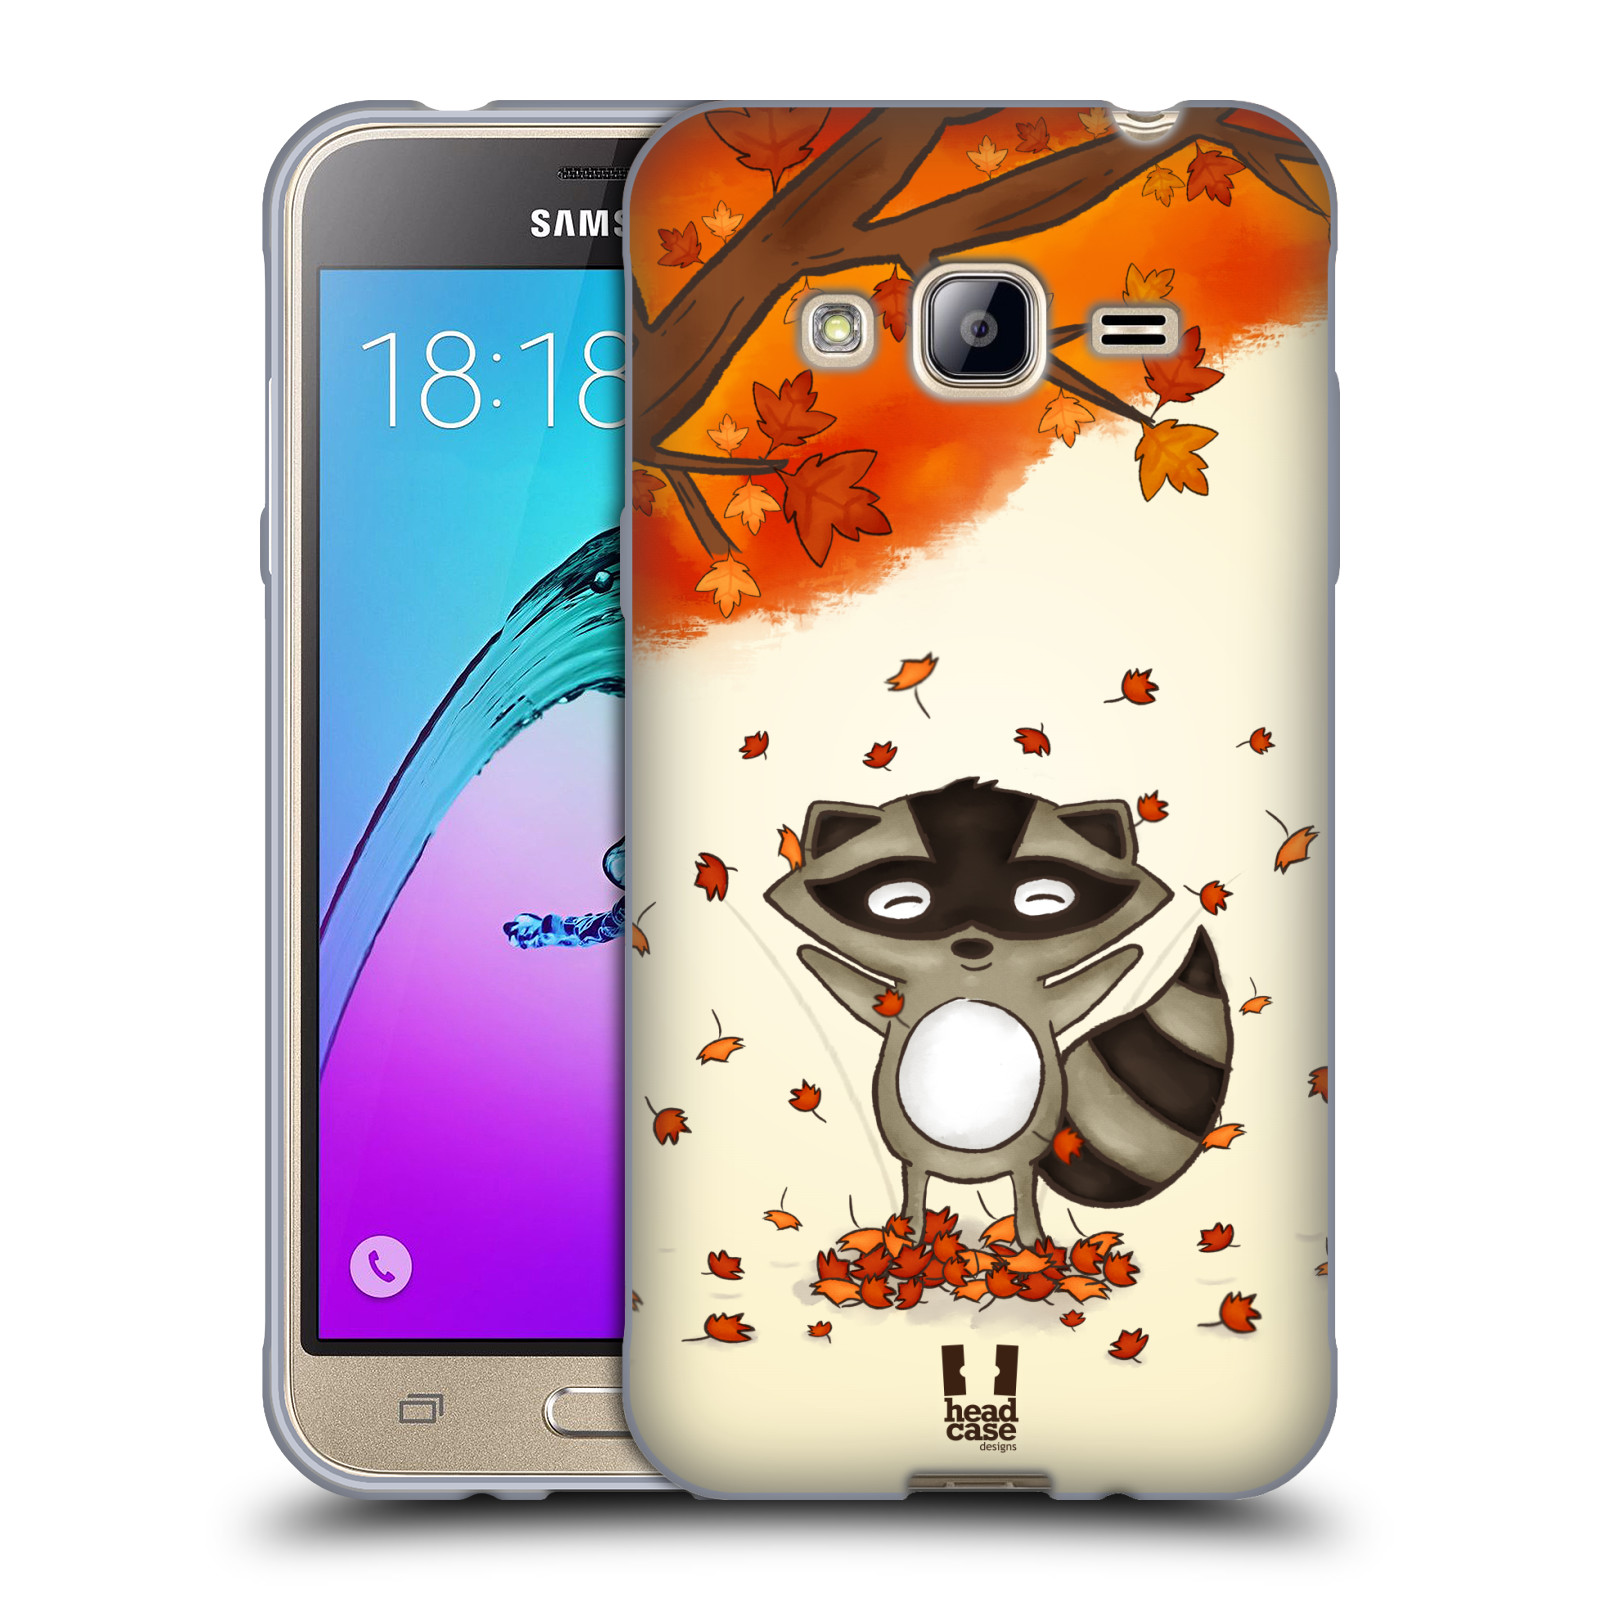 HEAD CASE silikonový obal na mobil Samsung Galaxy J3, J3 2016 vzor podzimní zvířátka mýval